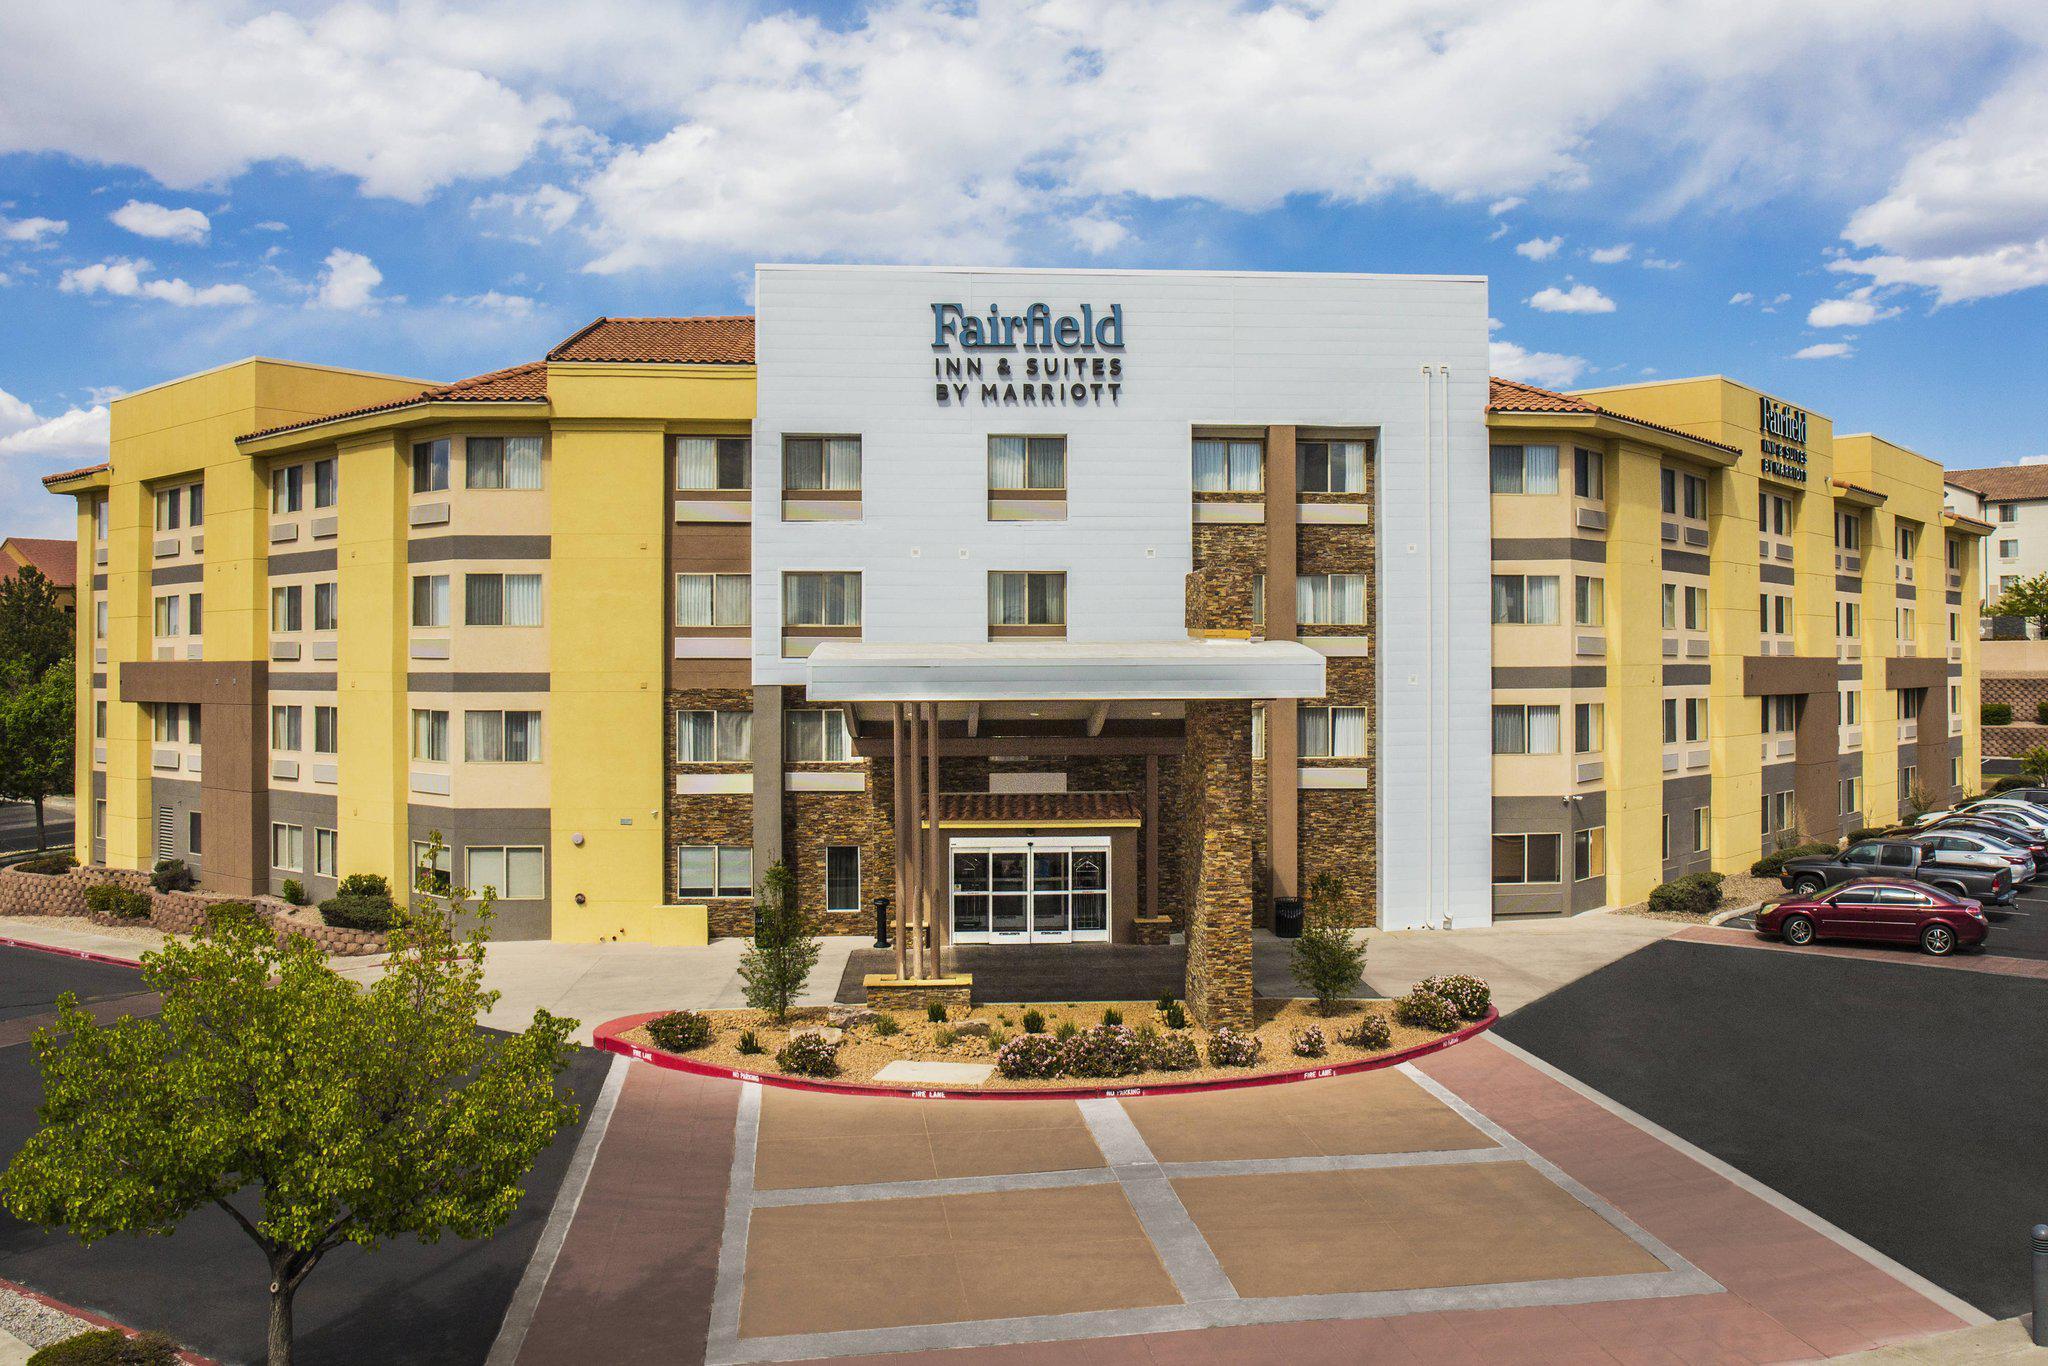 Fairfield Inn & Suites by Marriott Albuquerque Airport